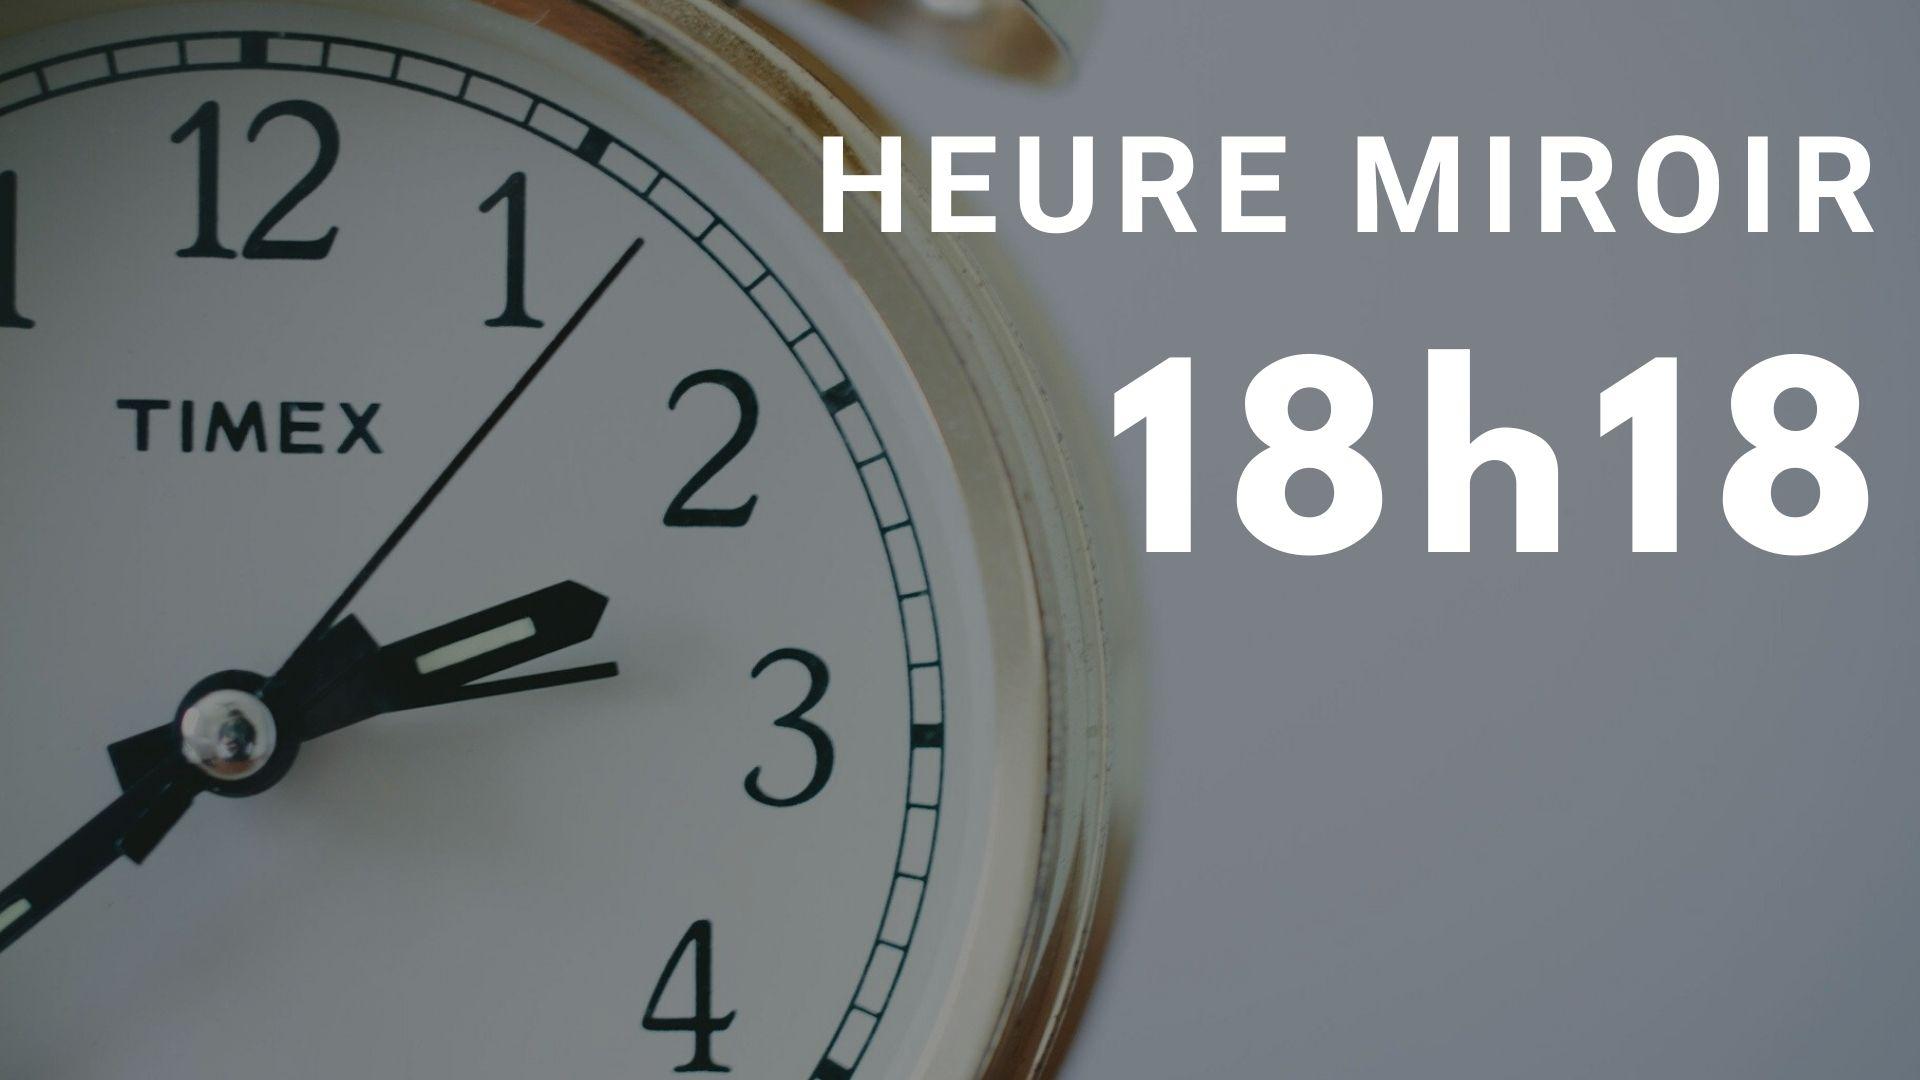 heure miroir 18h18